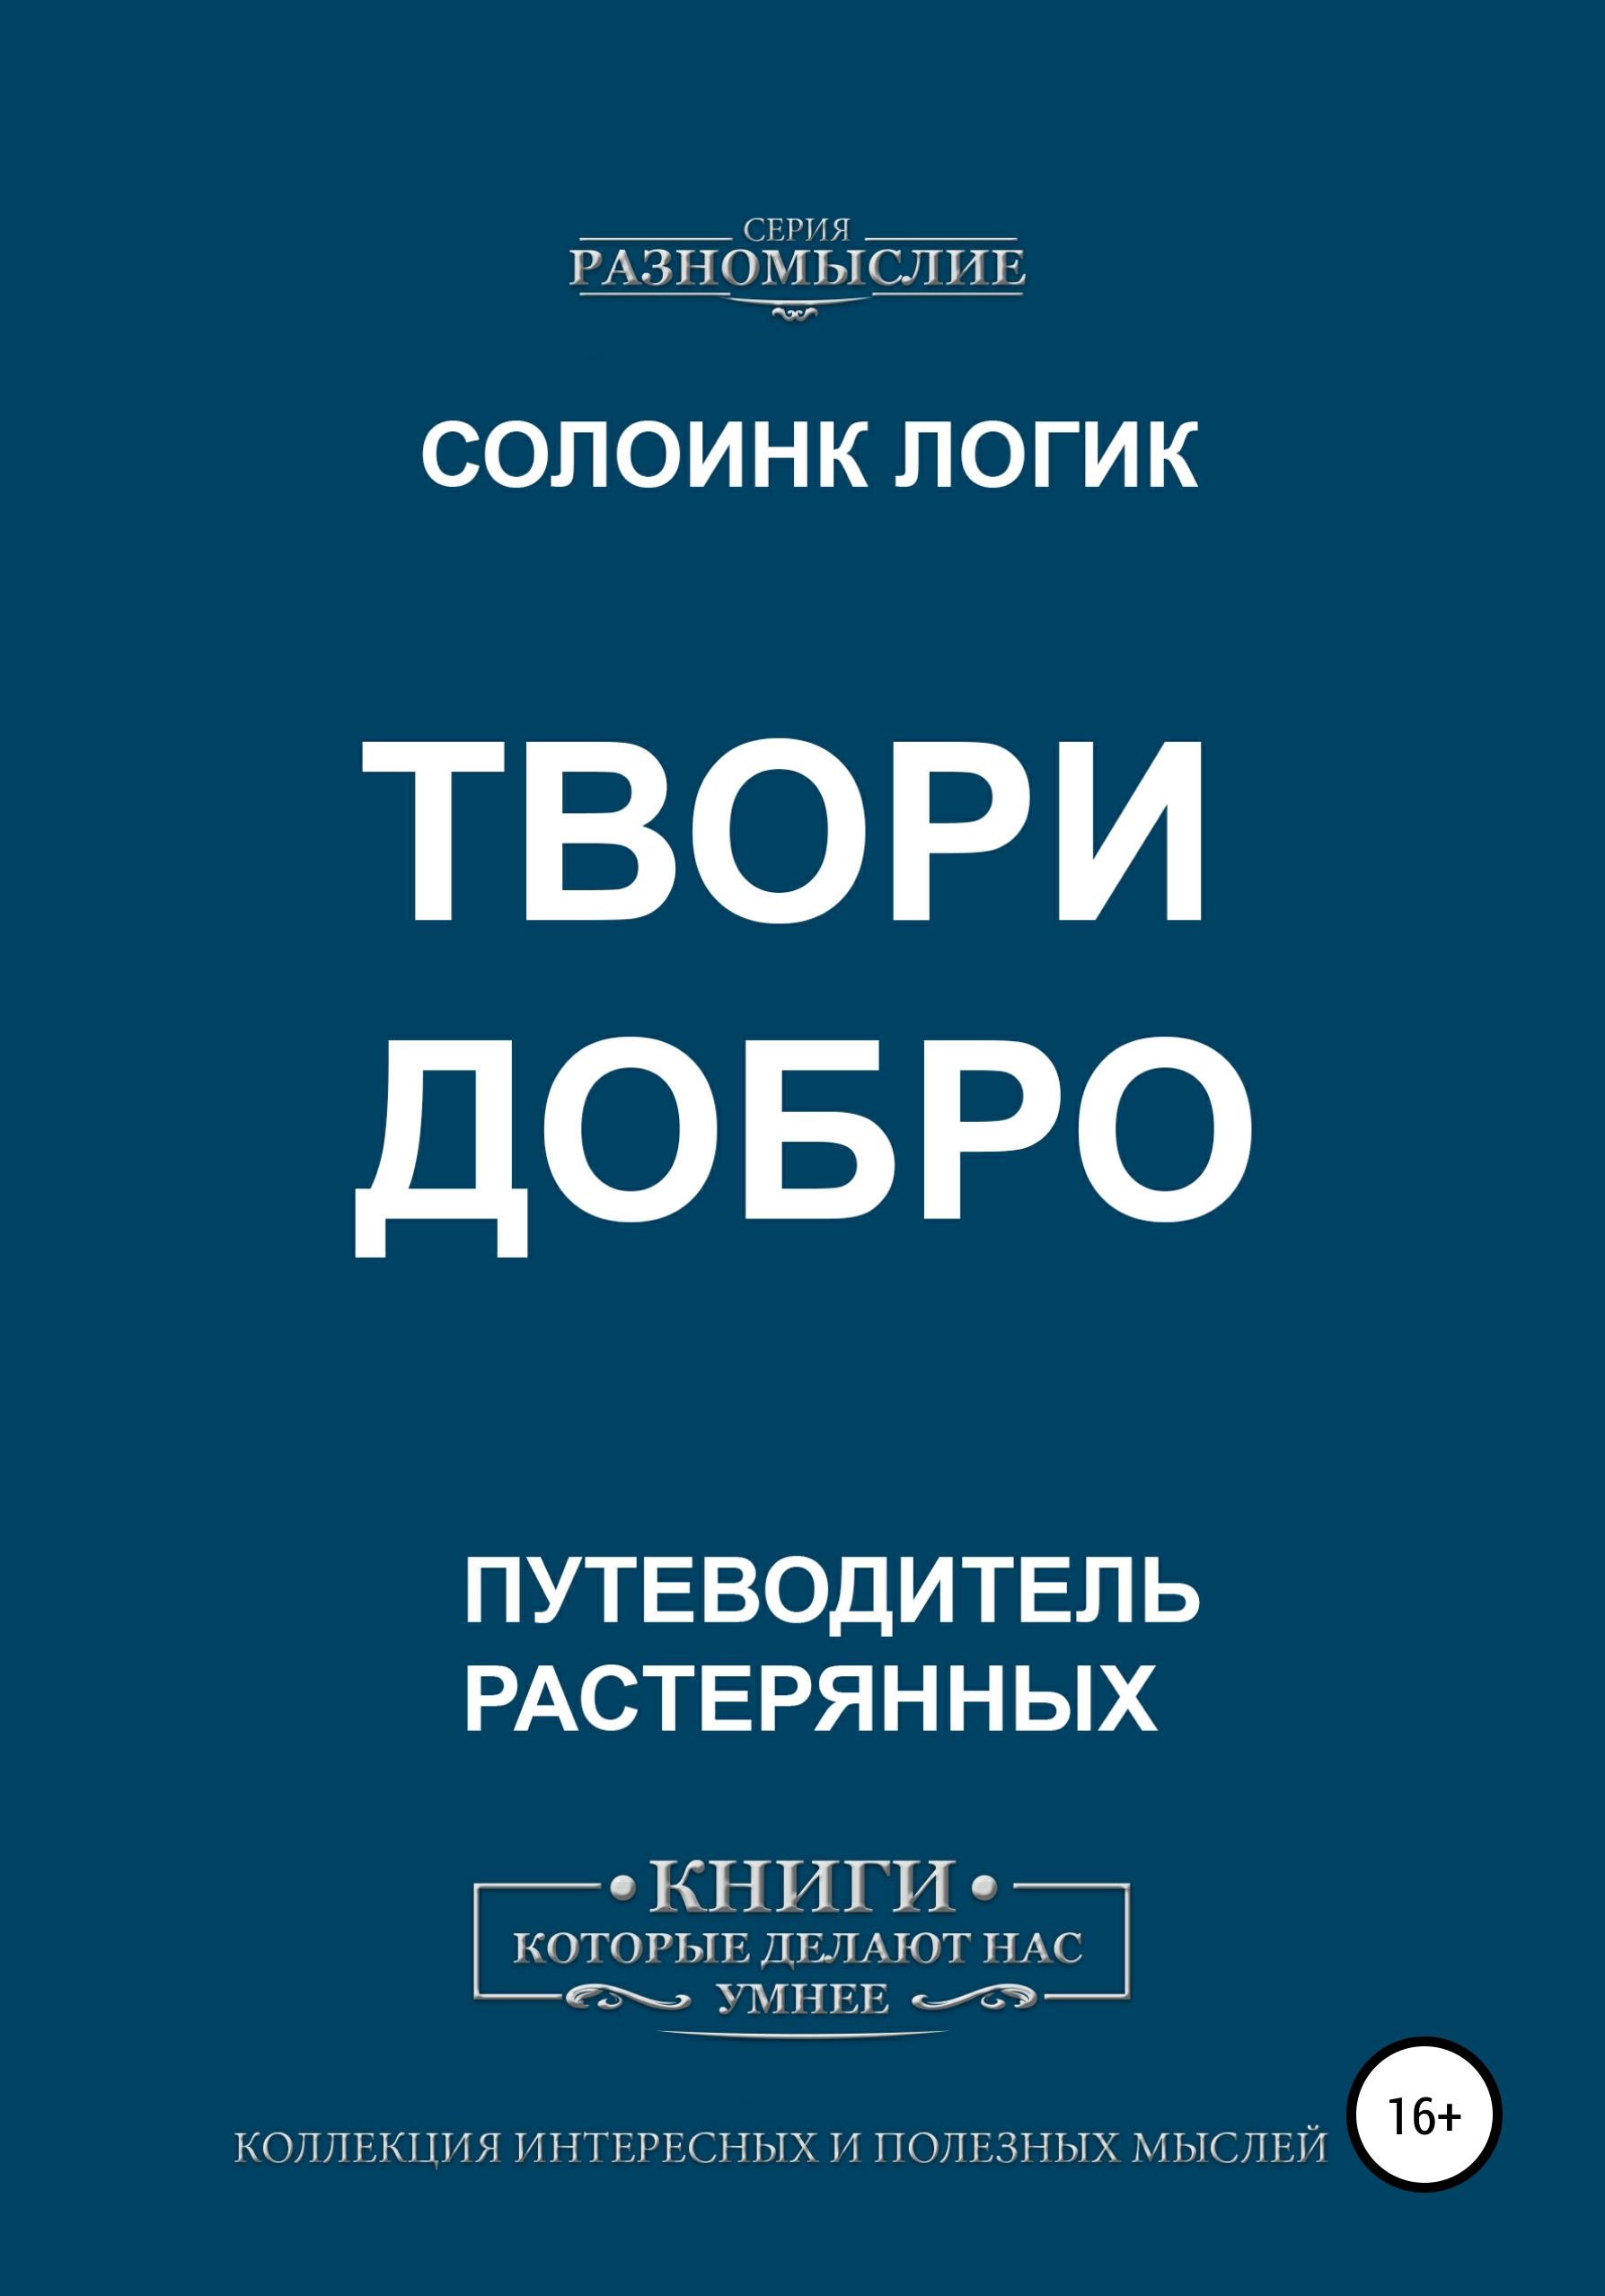 Купить книгу Твори добро, автора Солоинка Логик